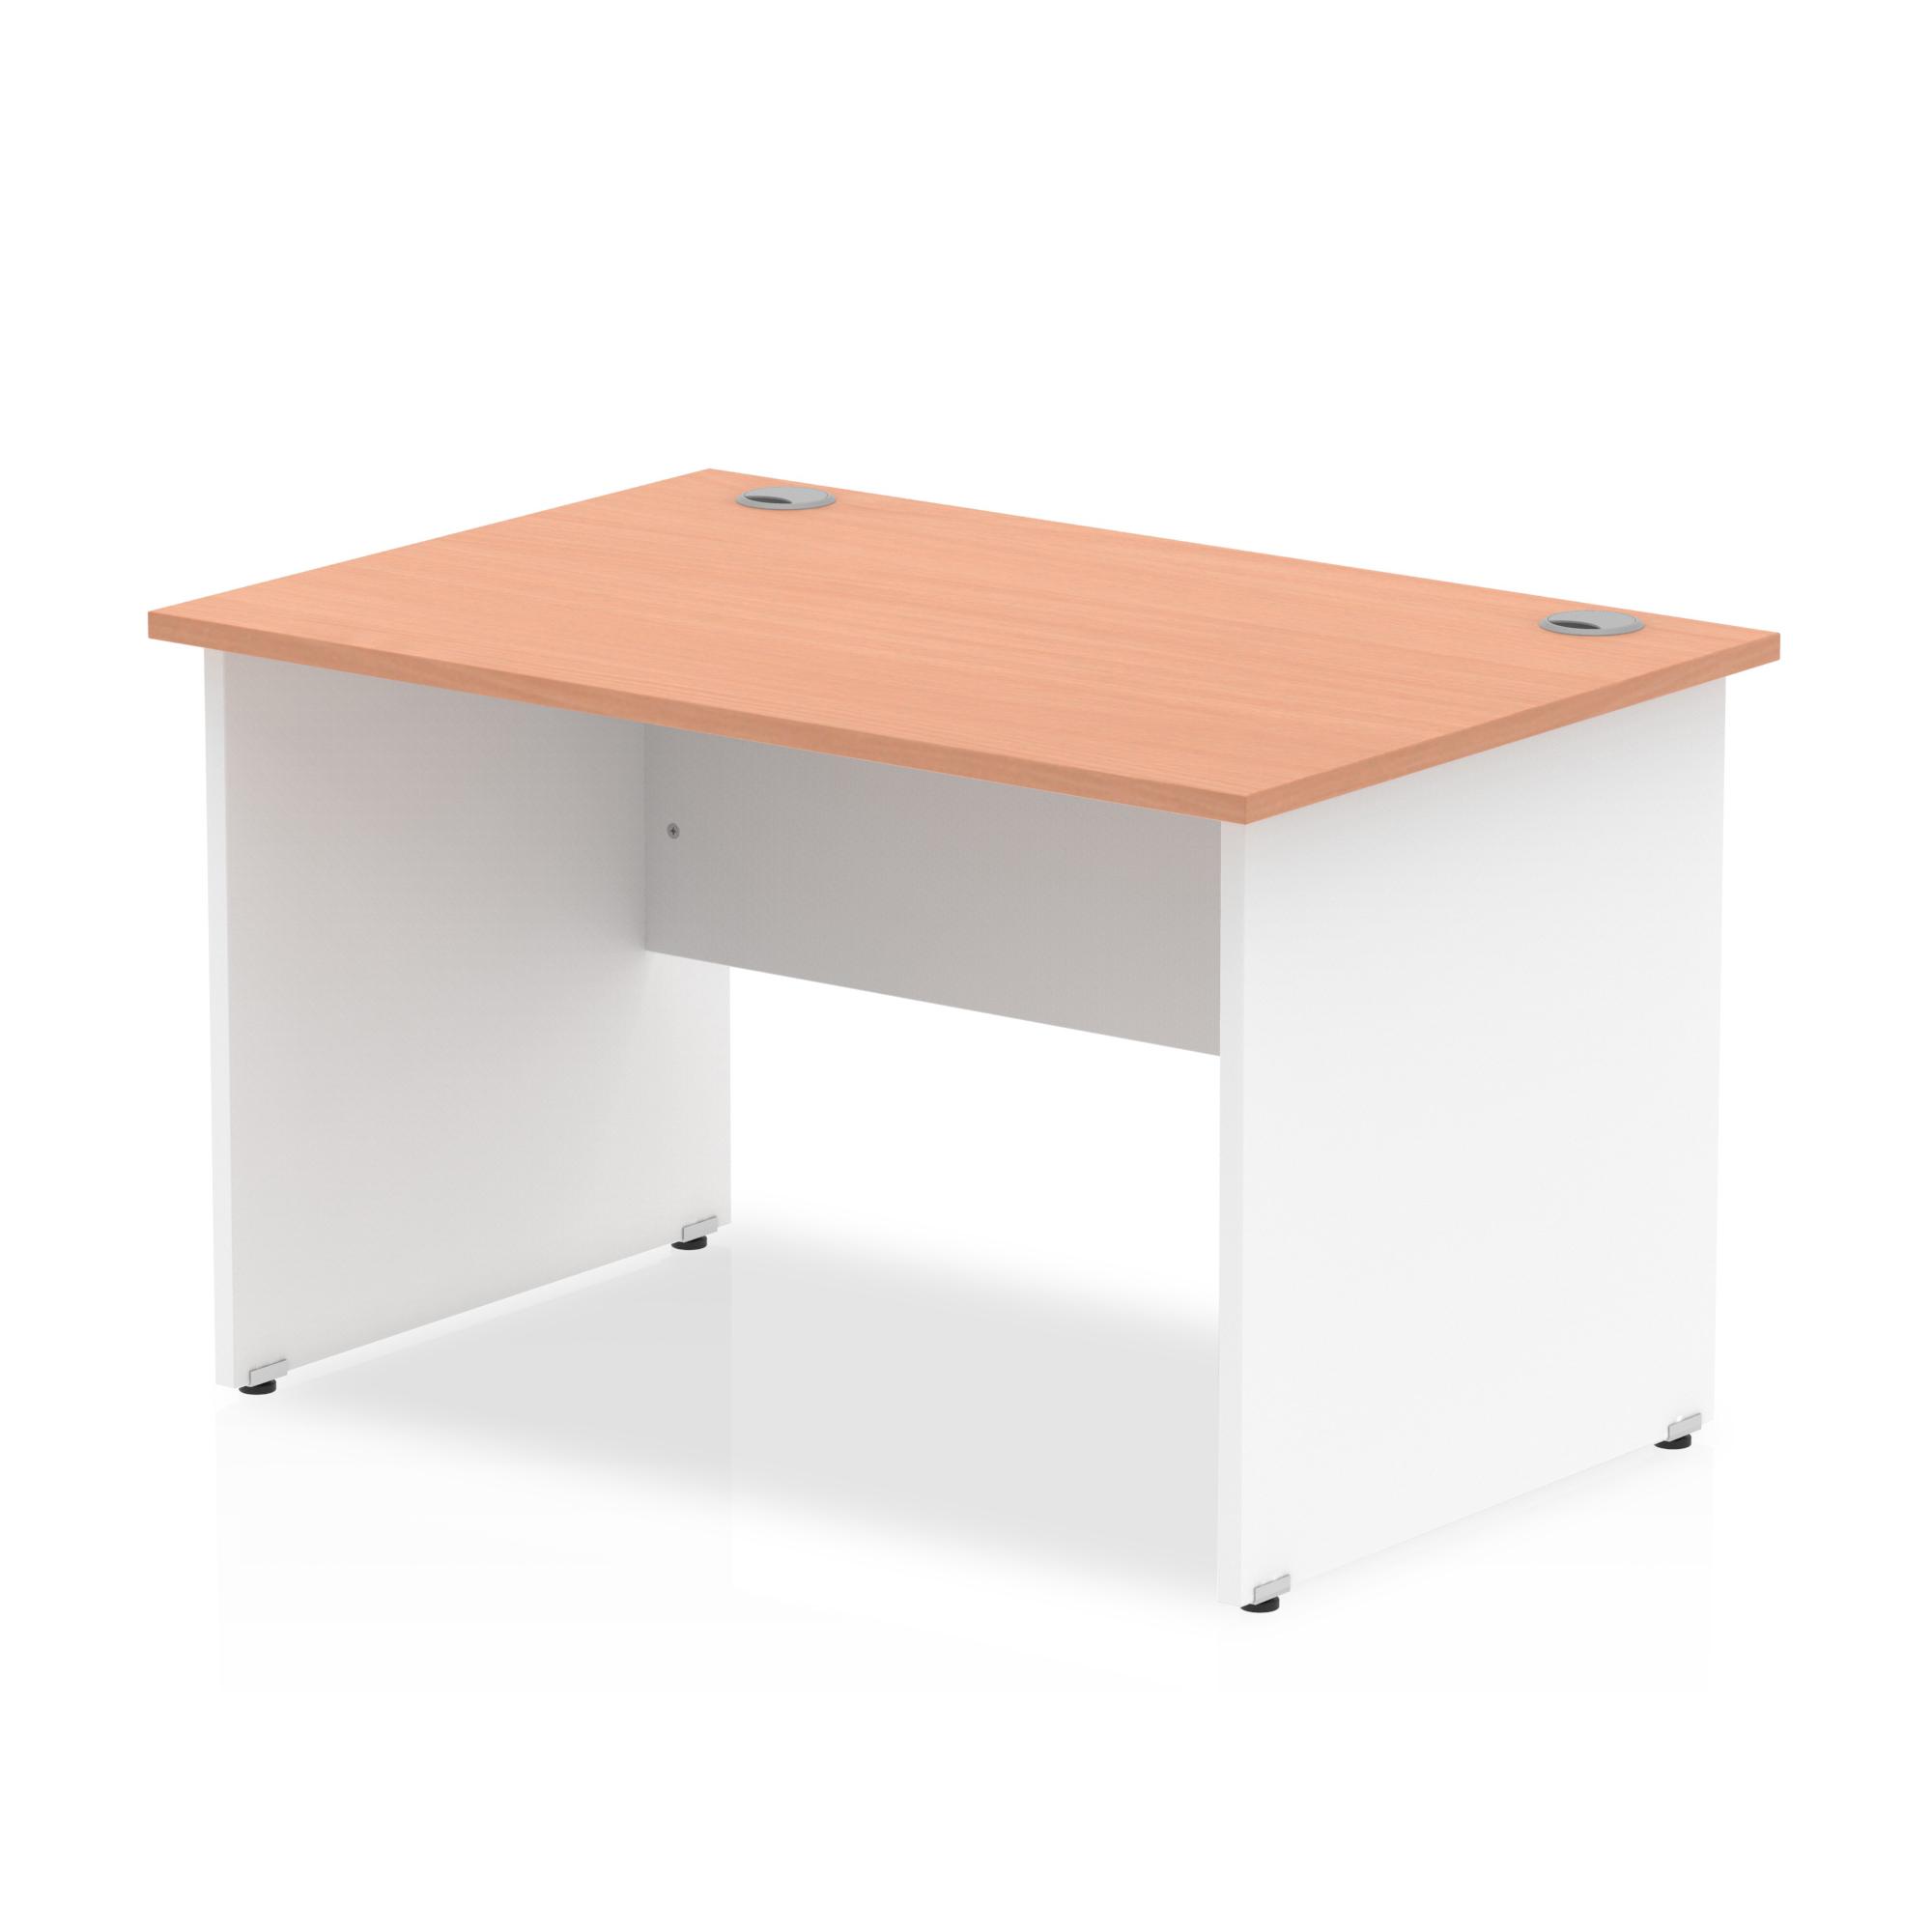 Trexus Desk Rectangle Panel End 1200x800mm Beech Top White Panels Ref TT000003